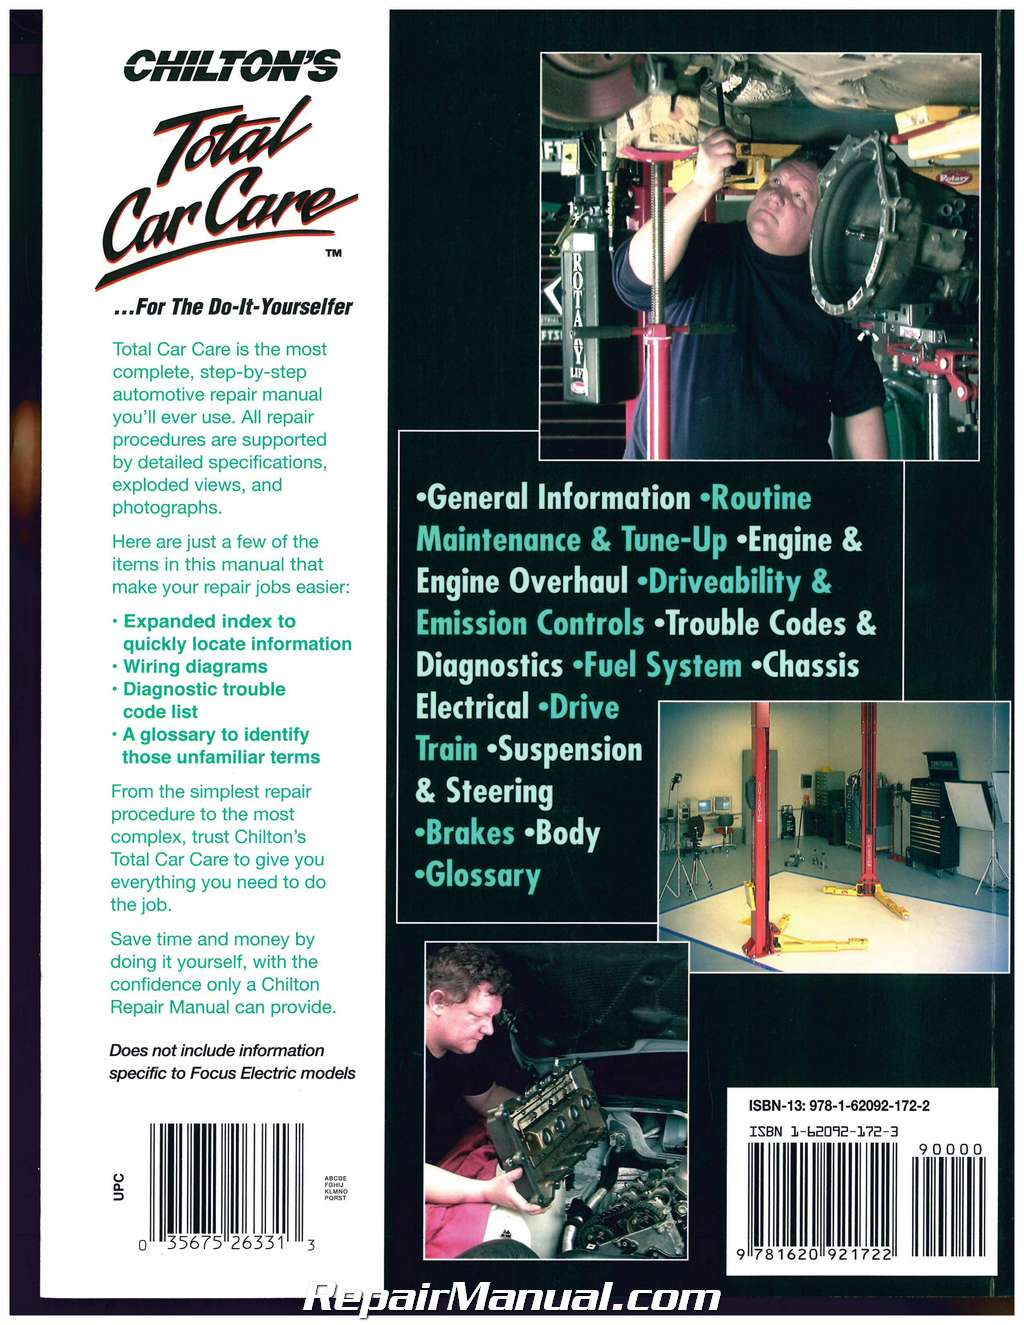 Ford Focus 2012 2013 2014 Chilton Automotive Repair Manual Codes